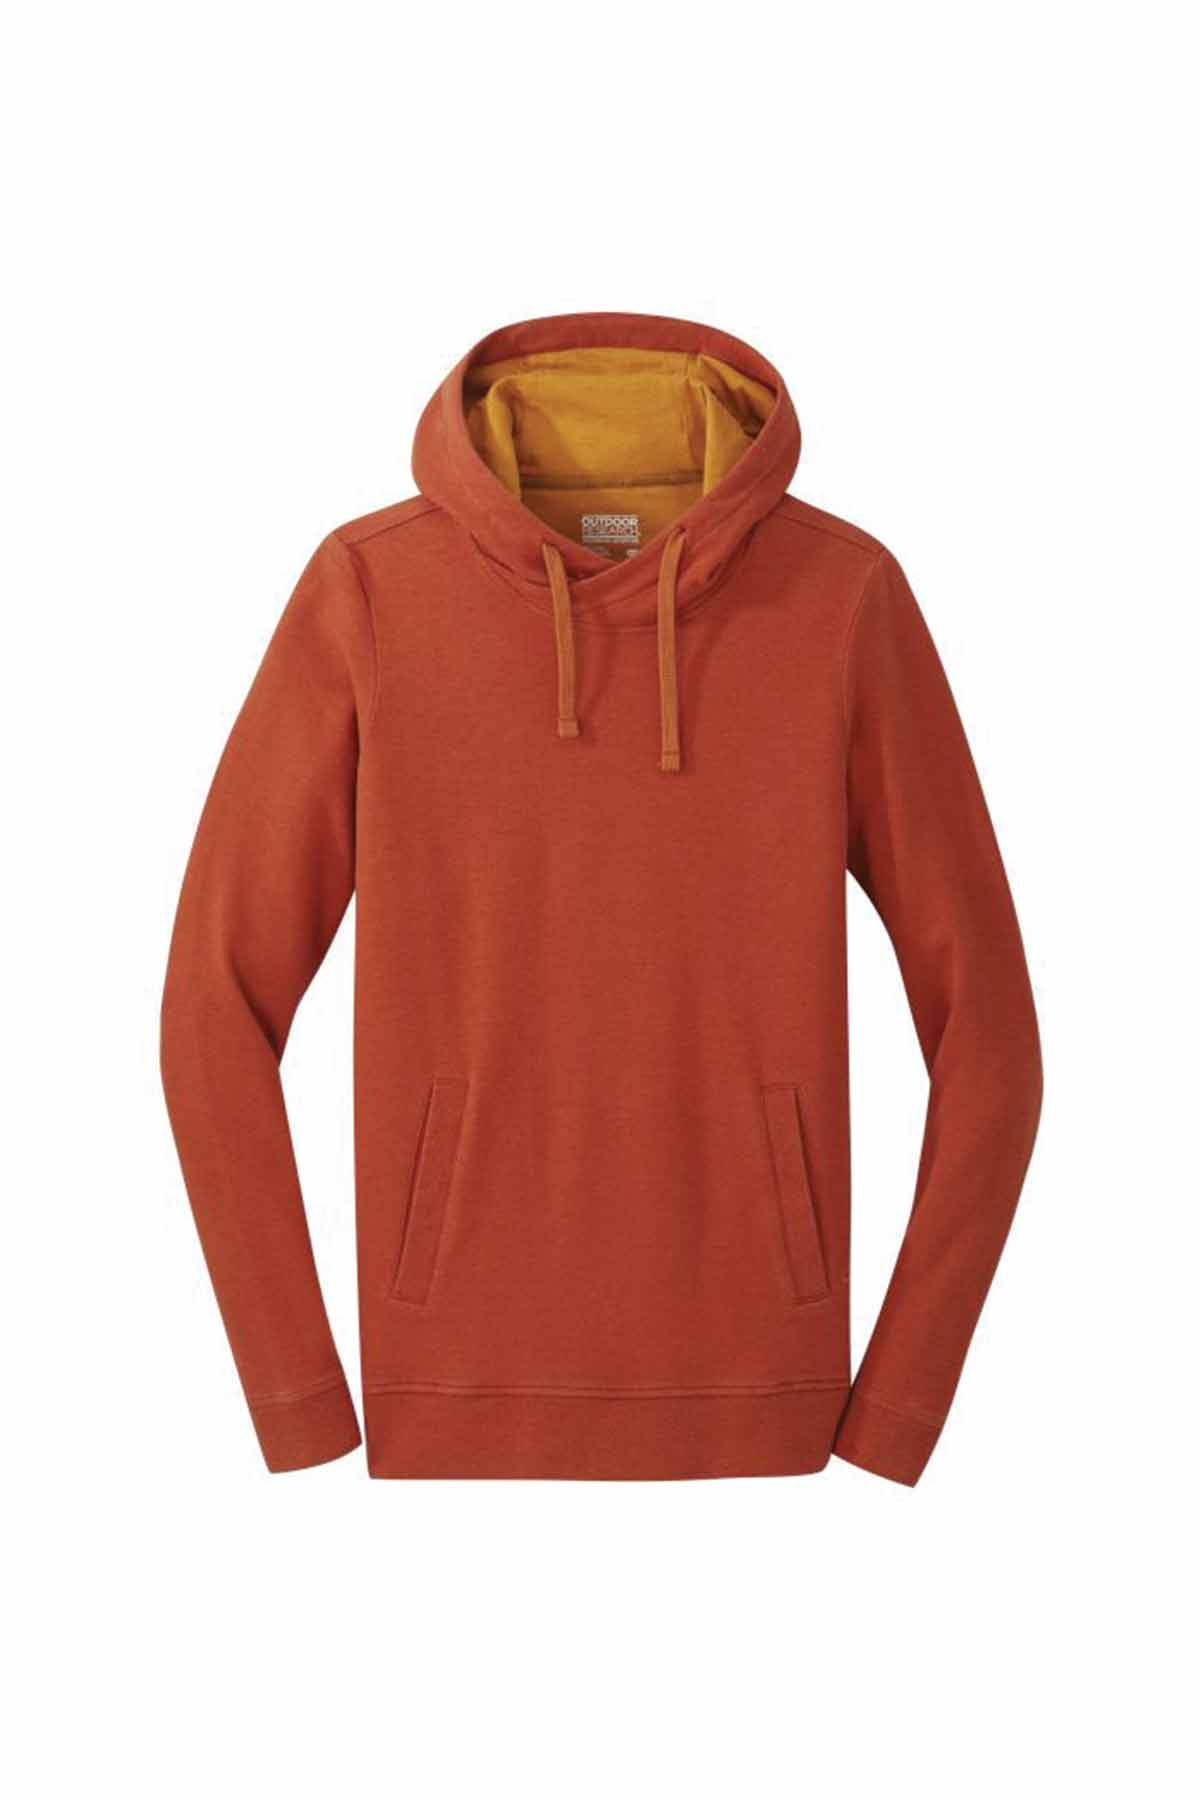 OR Men's Sonora Burnt Orange Hoody